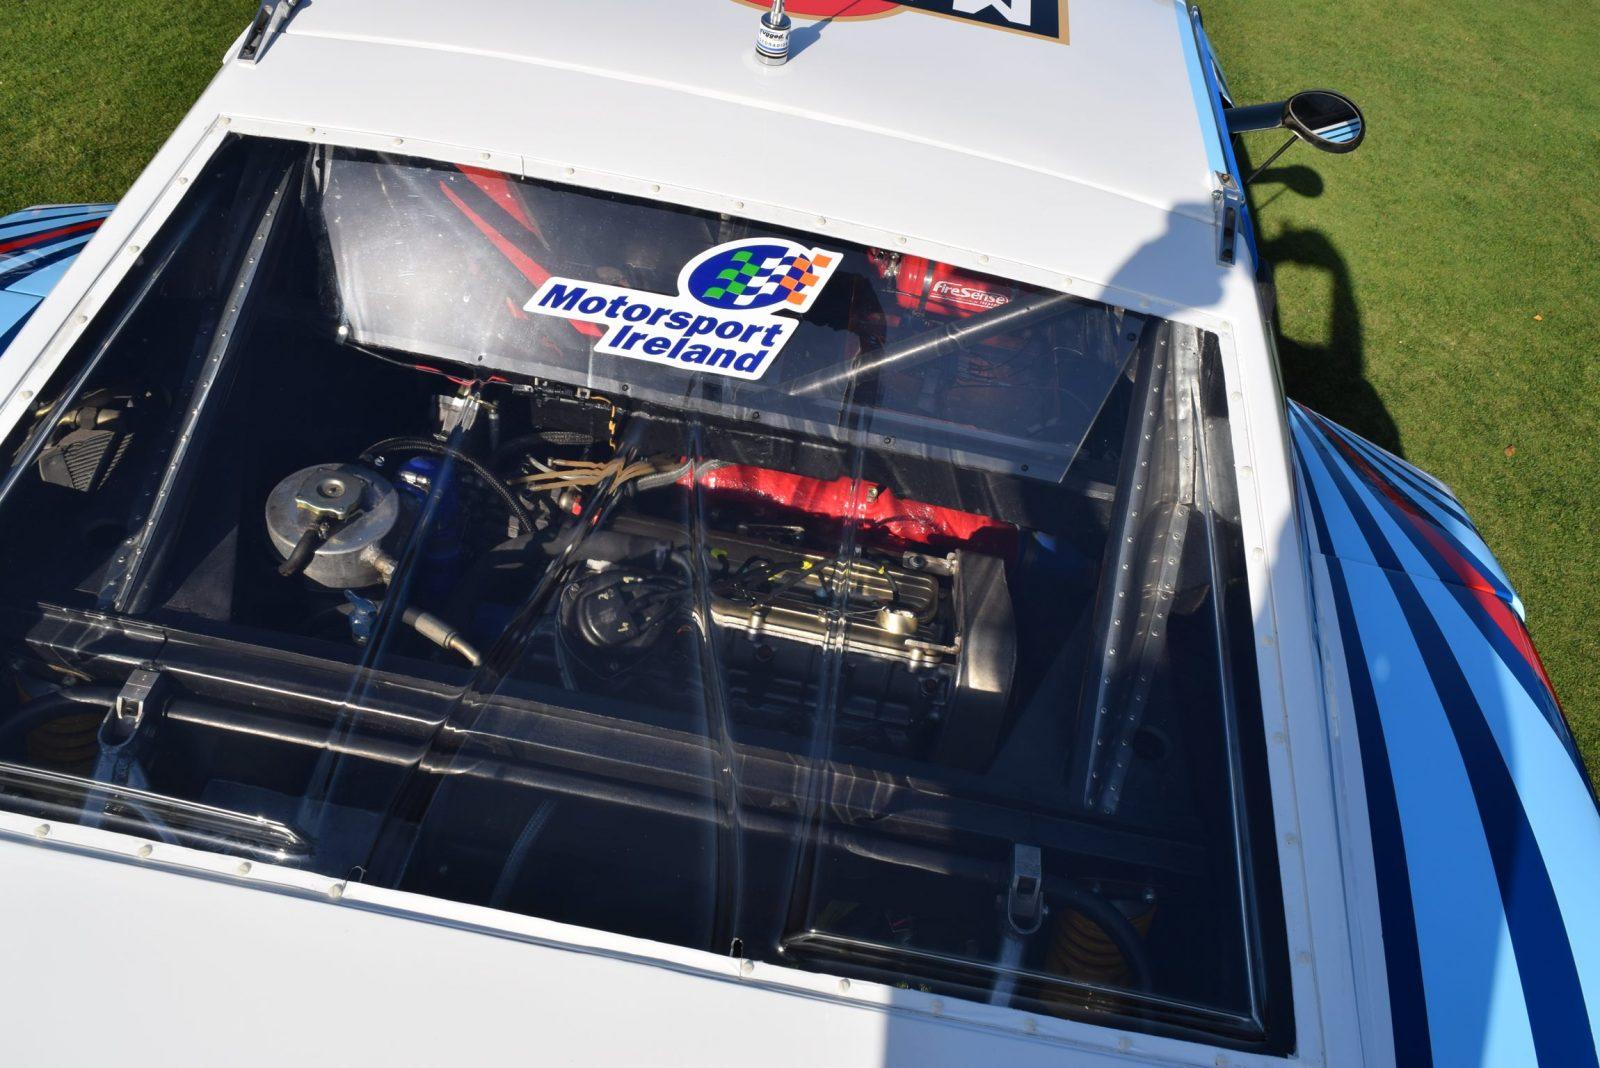 1981 Lancia BETA Monte Carlo Turbo 22